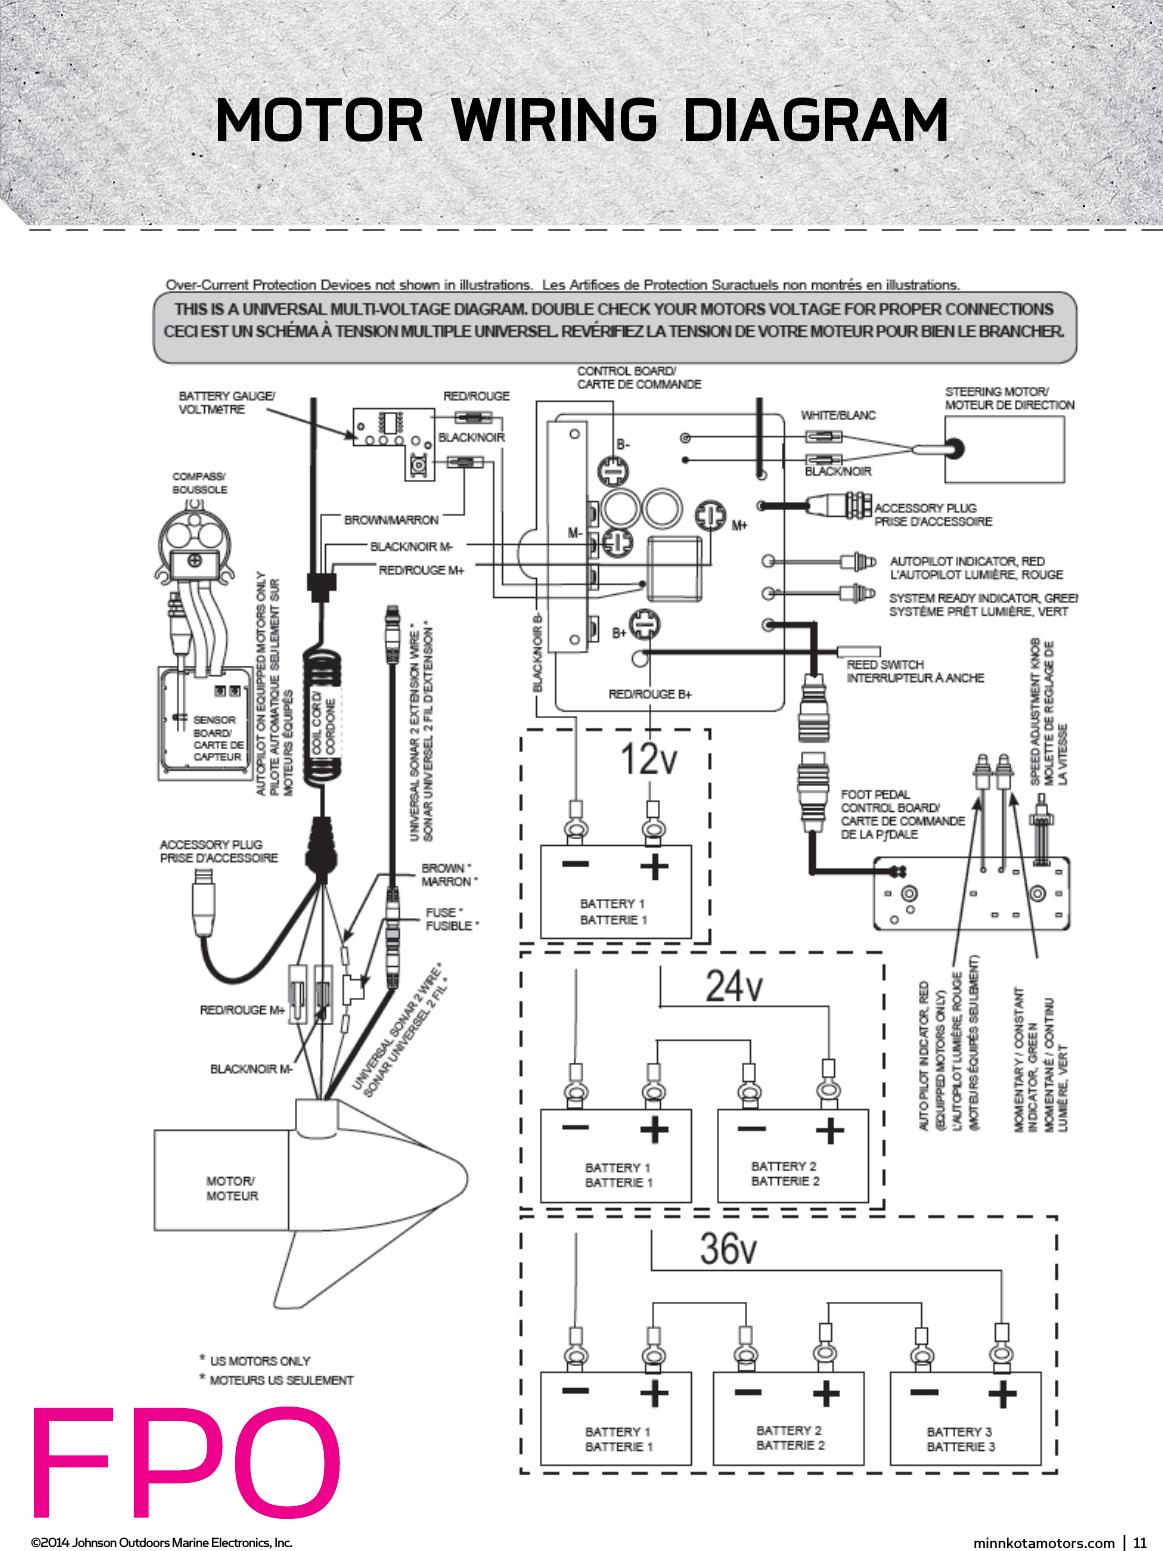 Minn Kota Power Drive Wiring Diagram